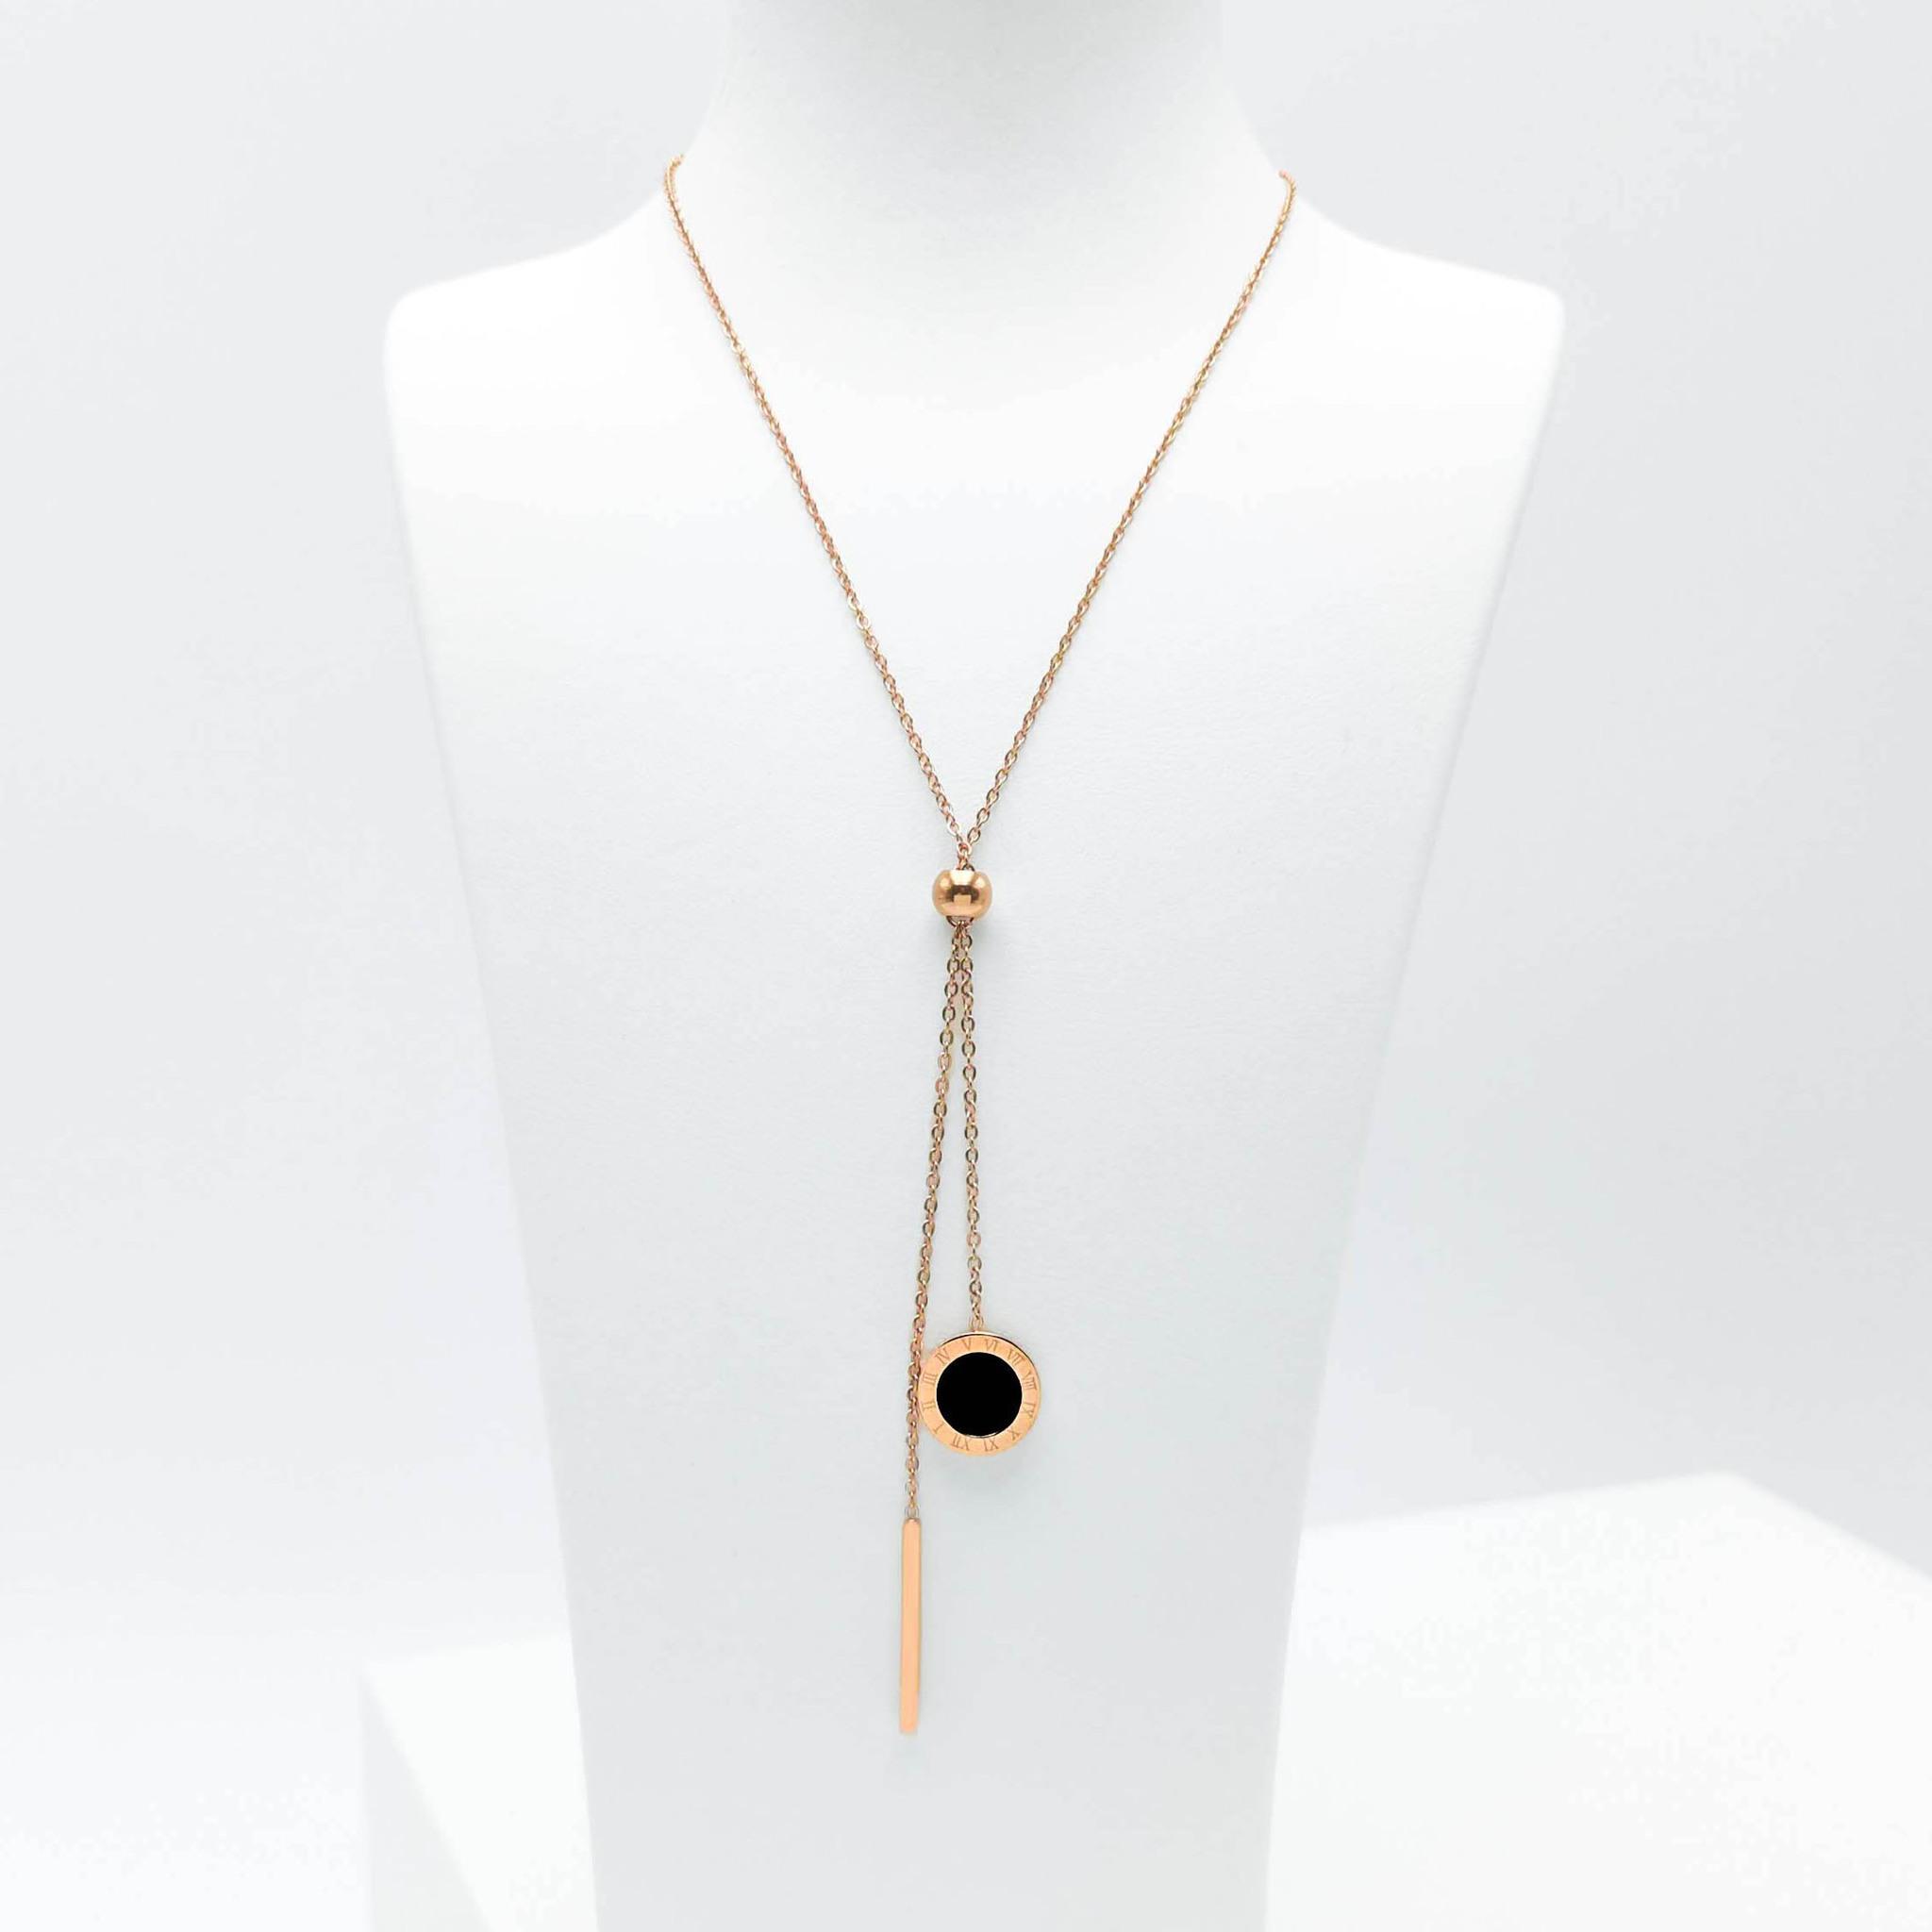 Era Elegance Grace Brace bild 1 Dam halsband. Modern, stilren och exklusive Smycke.